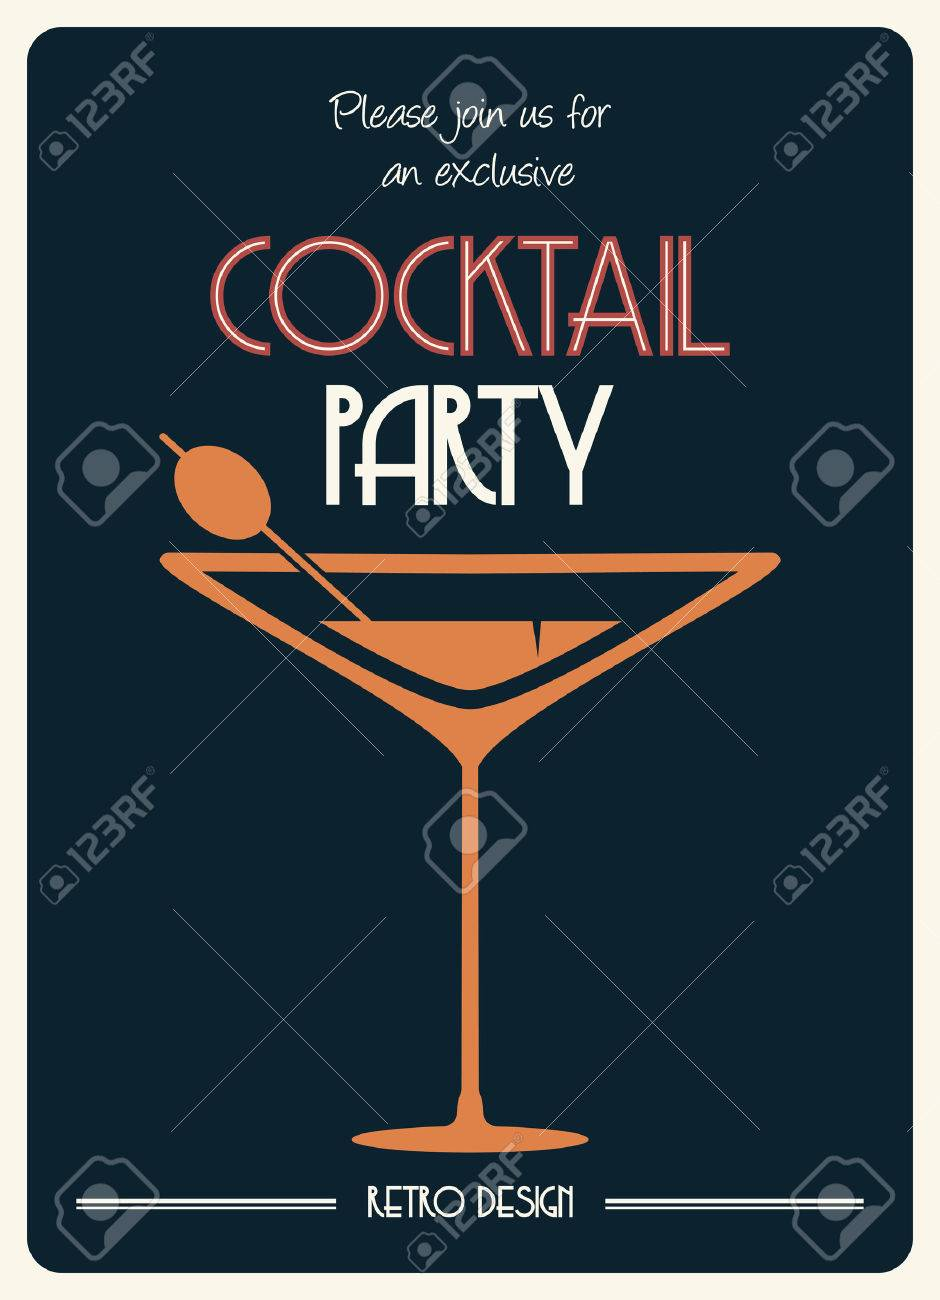 cocktail retro poster - 24355373